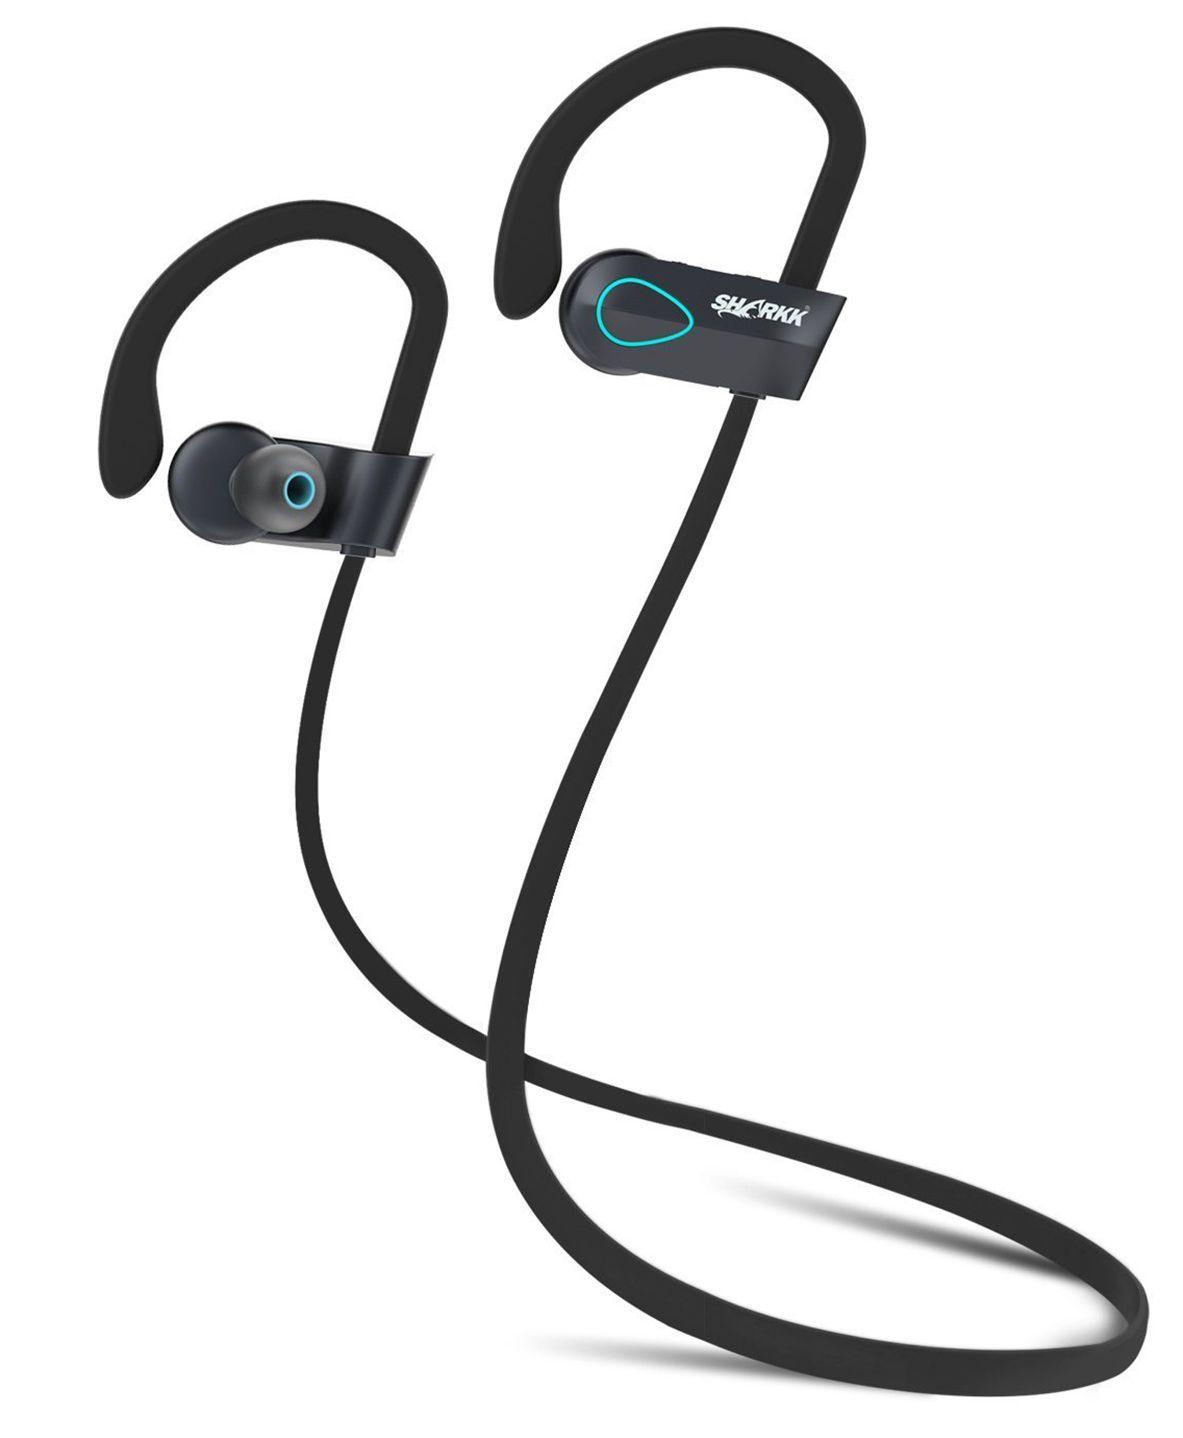 Unterhaltungselektronik Ugreen Usb Bluetooth Sender Empfänger 4,0 Adapter Dongle Aptx Wireless Kopfhörer Pc Musik Rezeptor Audio Bluetooth Adaptador